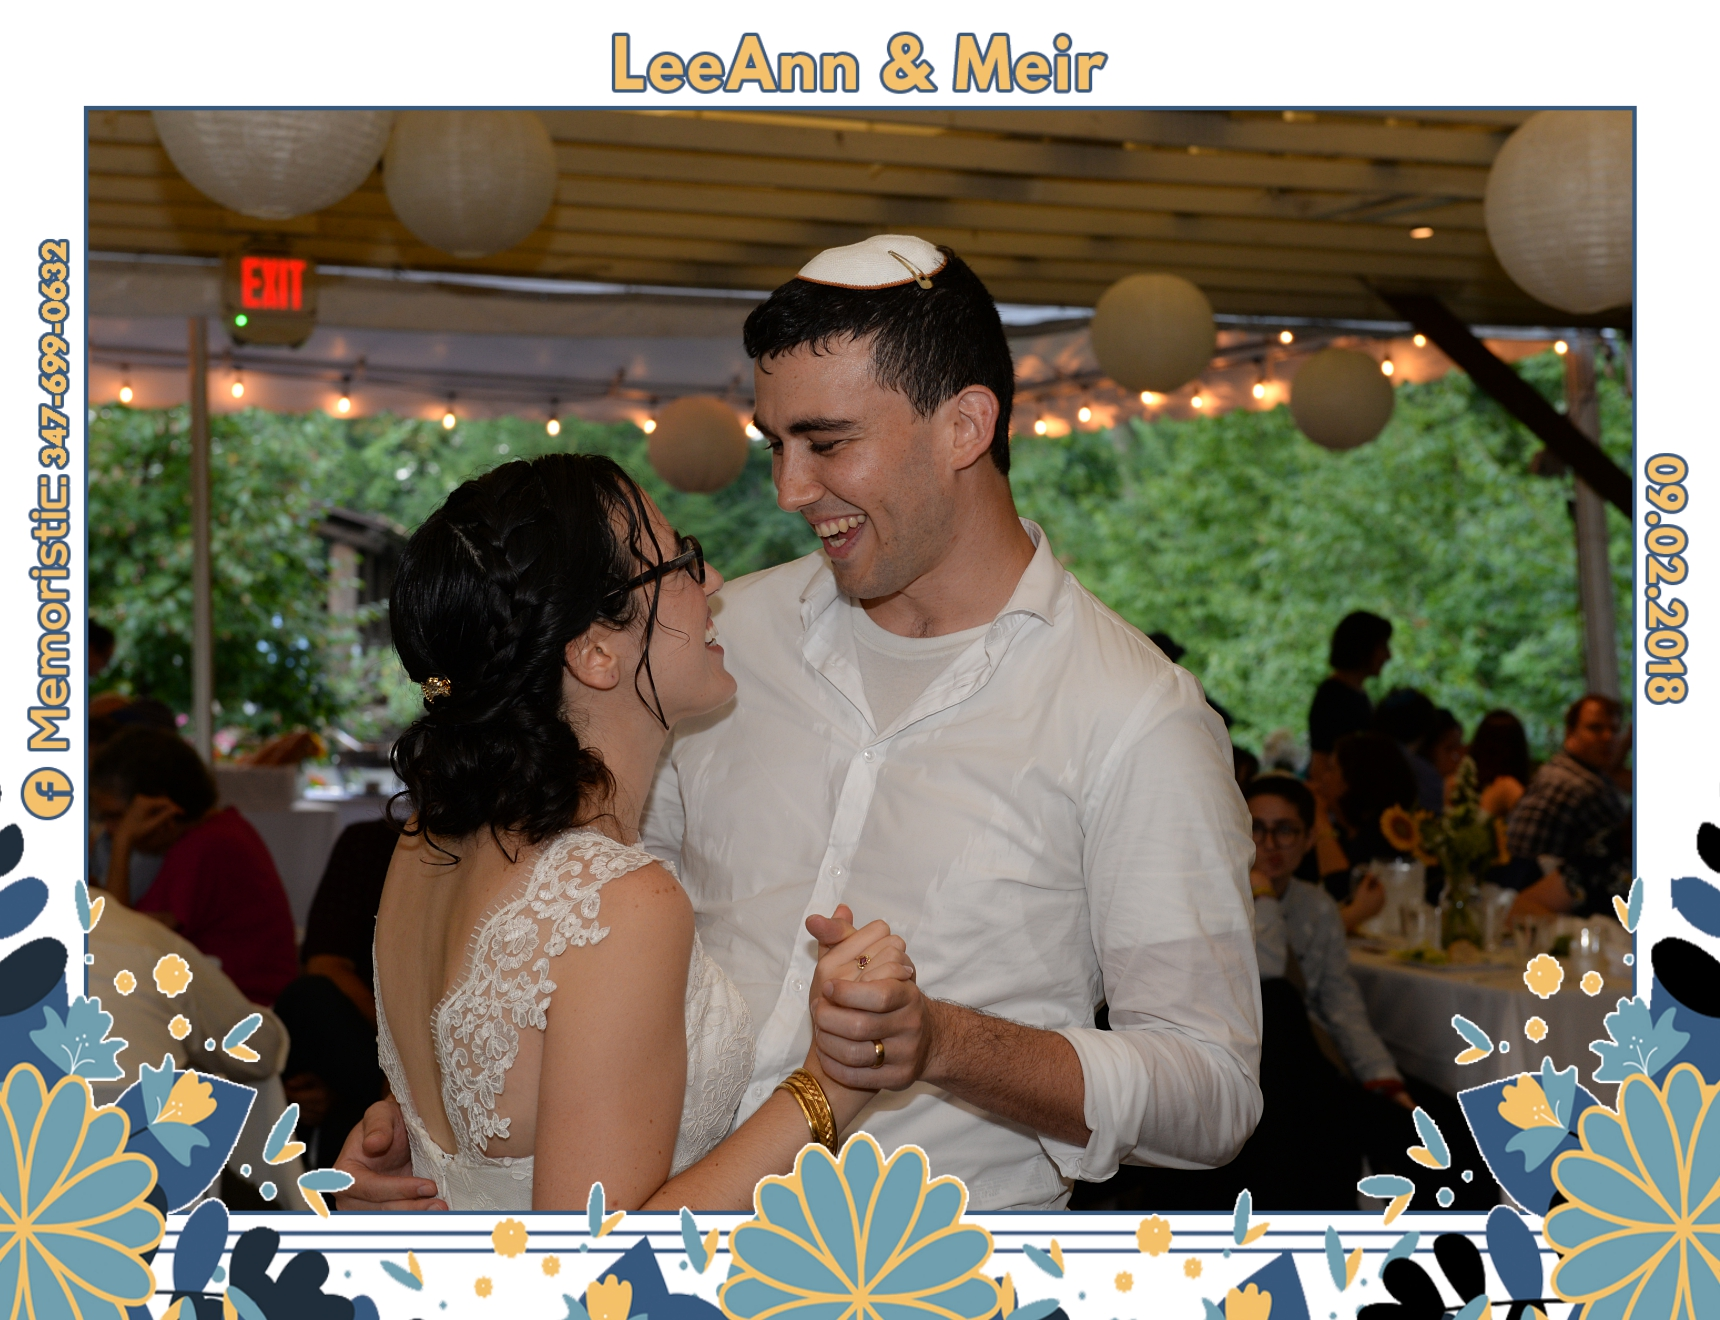 L&M Wedding Magnets Roaming.JPG